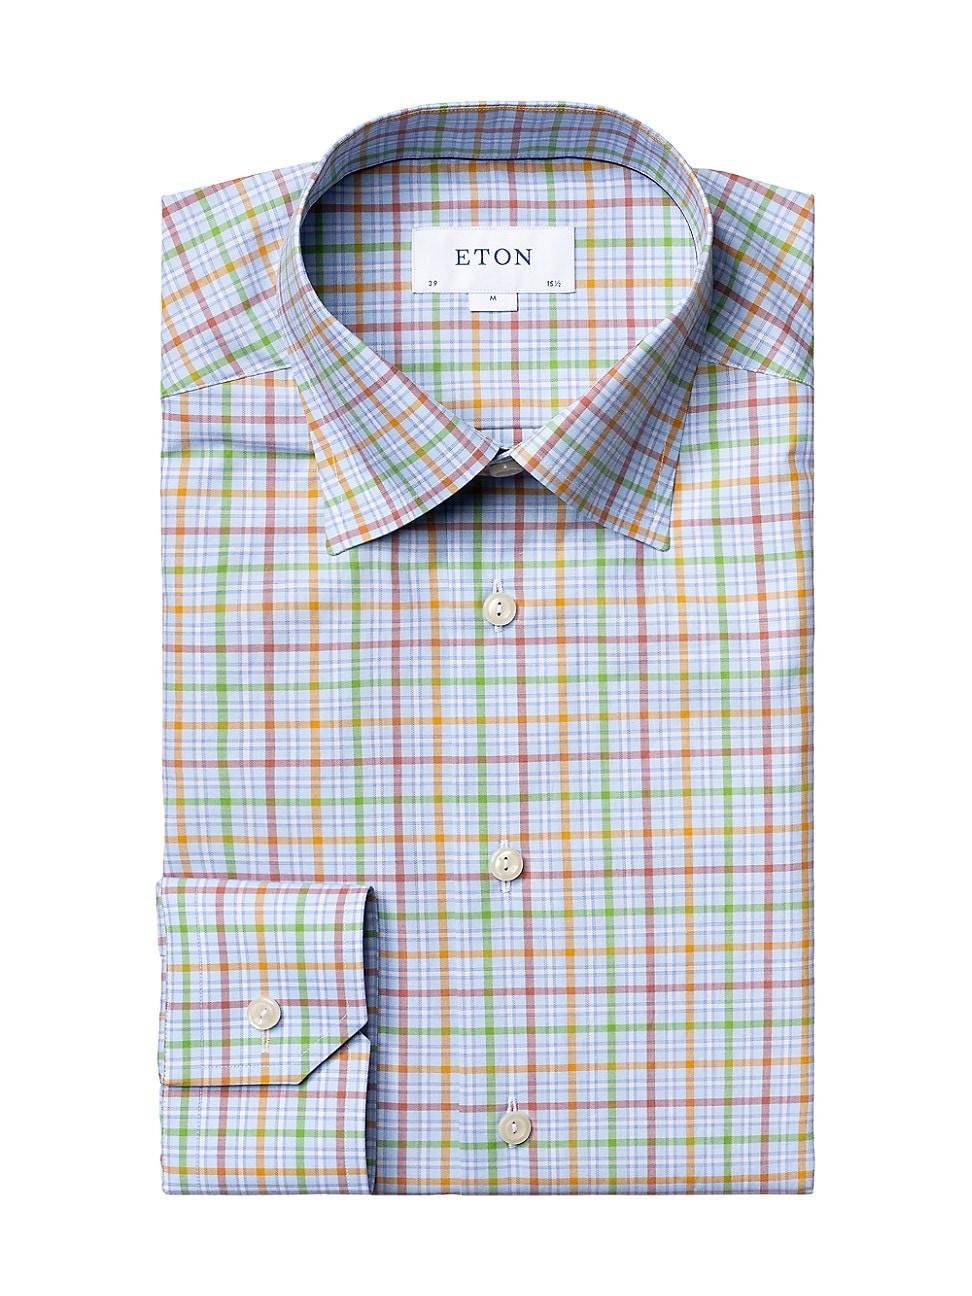 Eton MEN'S CONTEMPORARY-FIT WINDOWPANE PLAID DRESS SHIRT